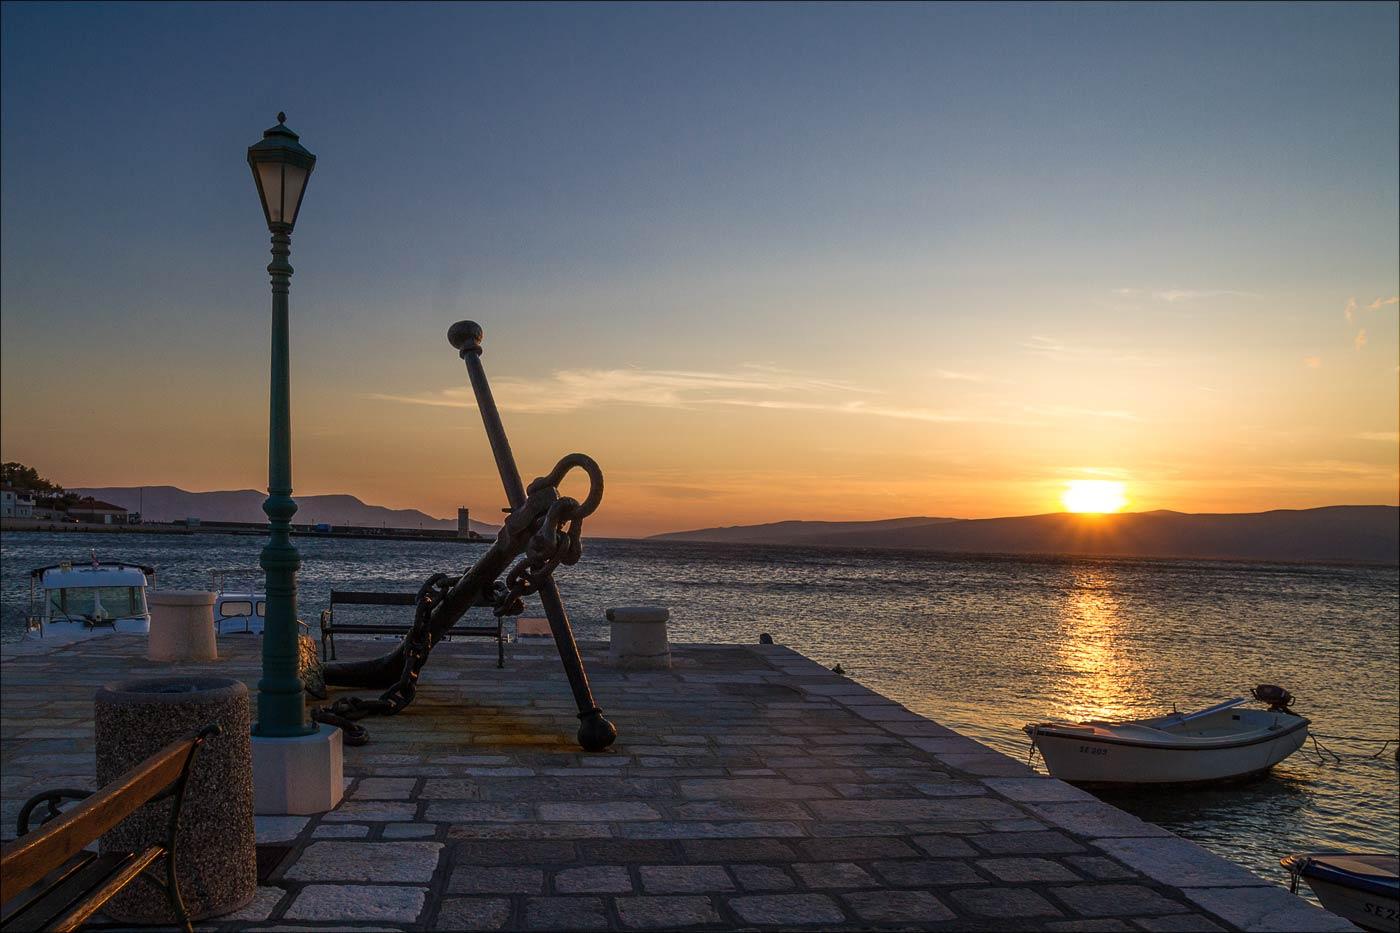 Закат, Сень, Хорватия